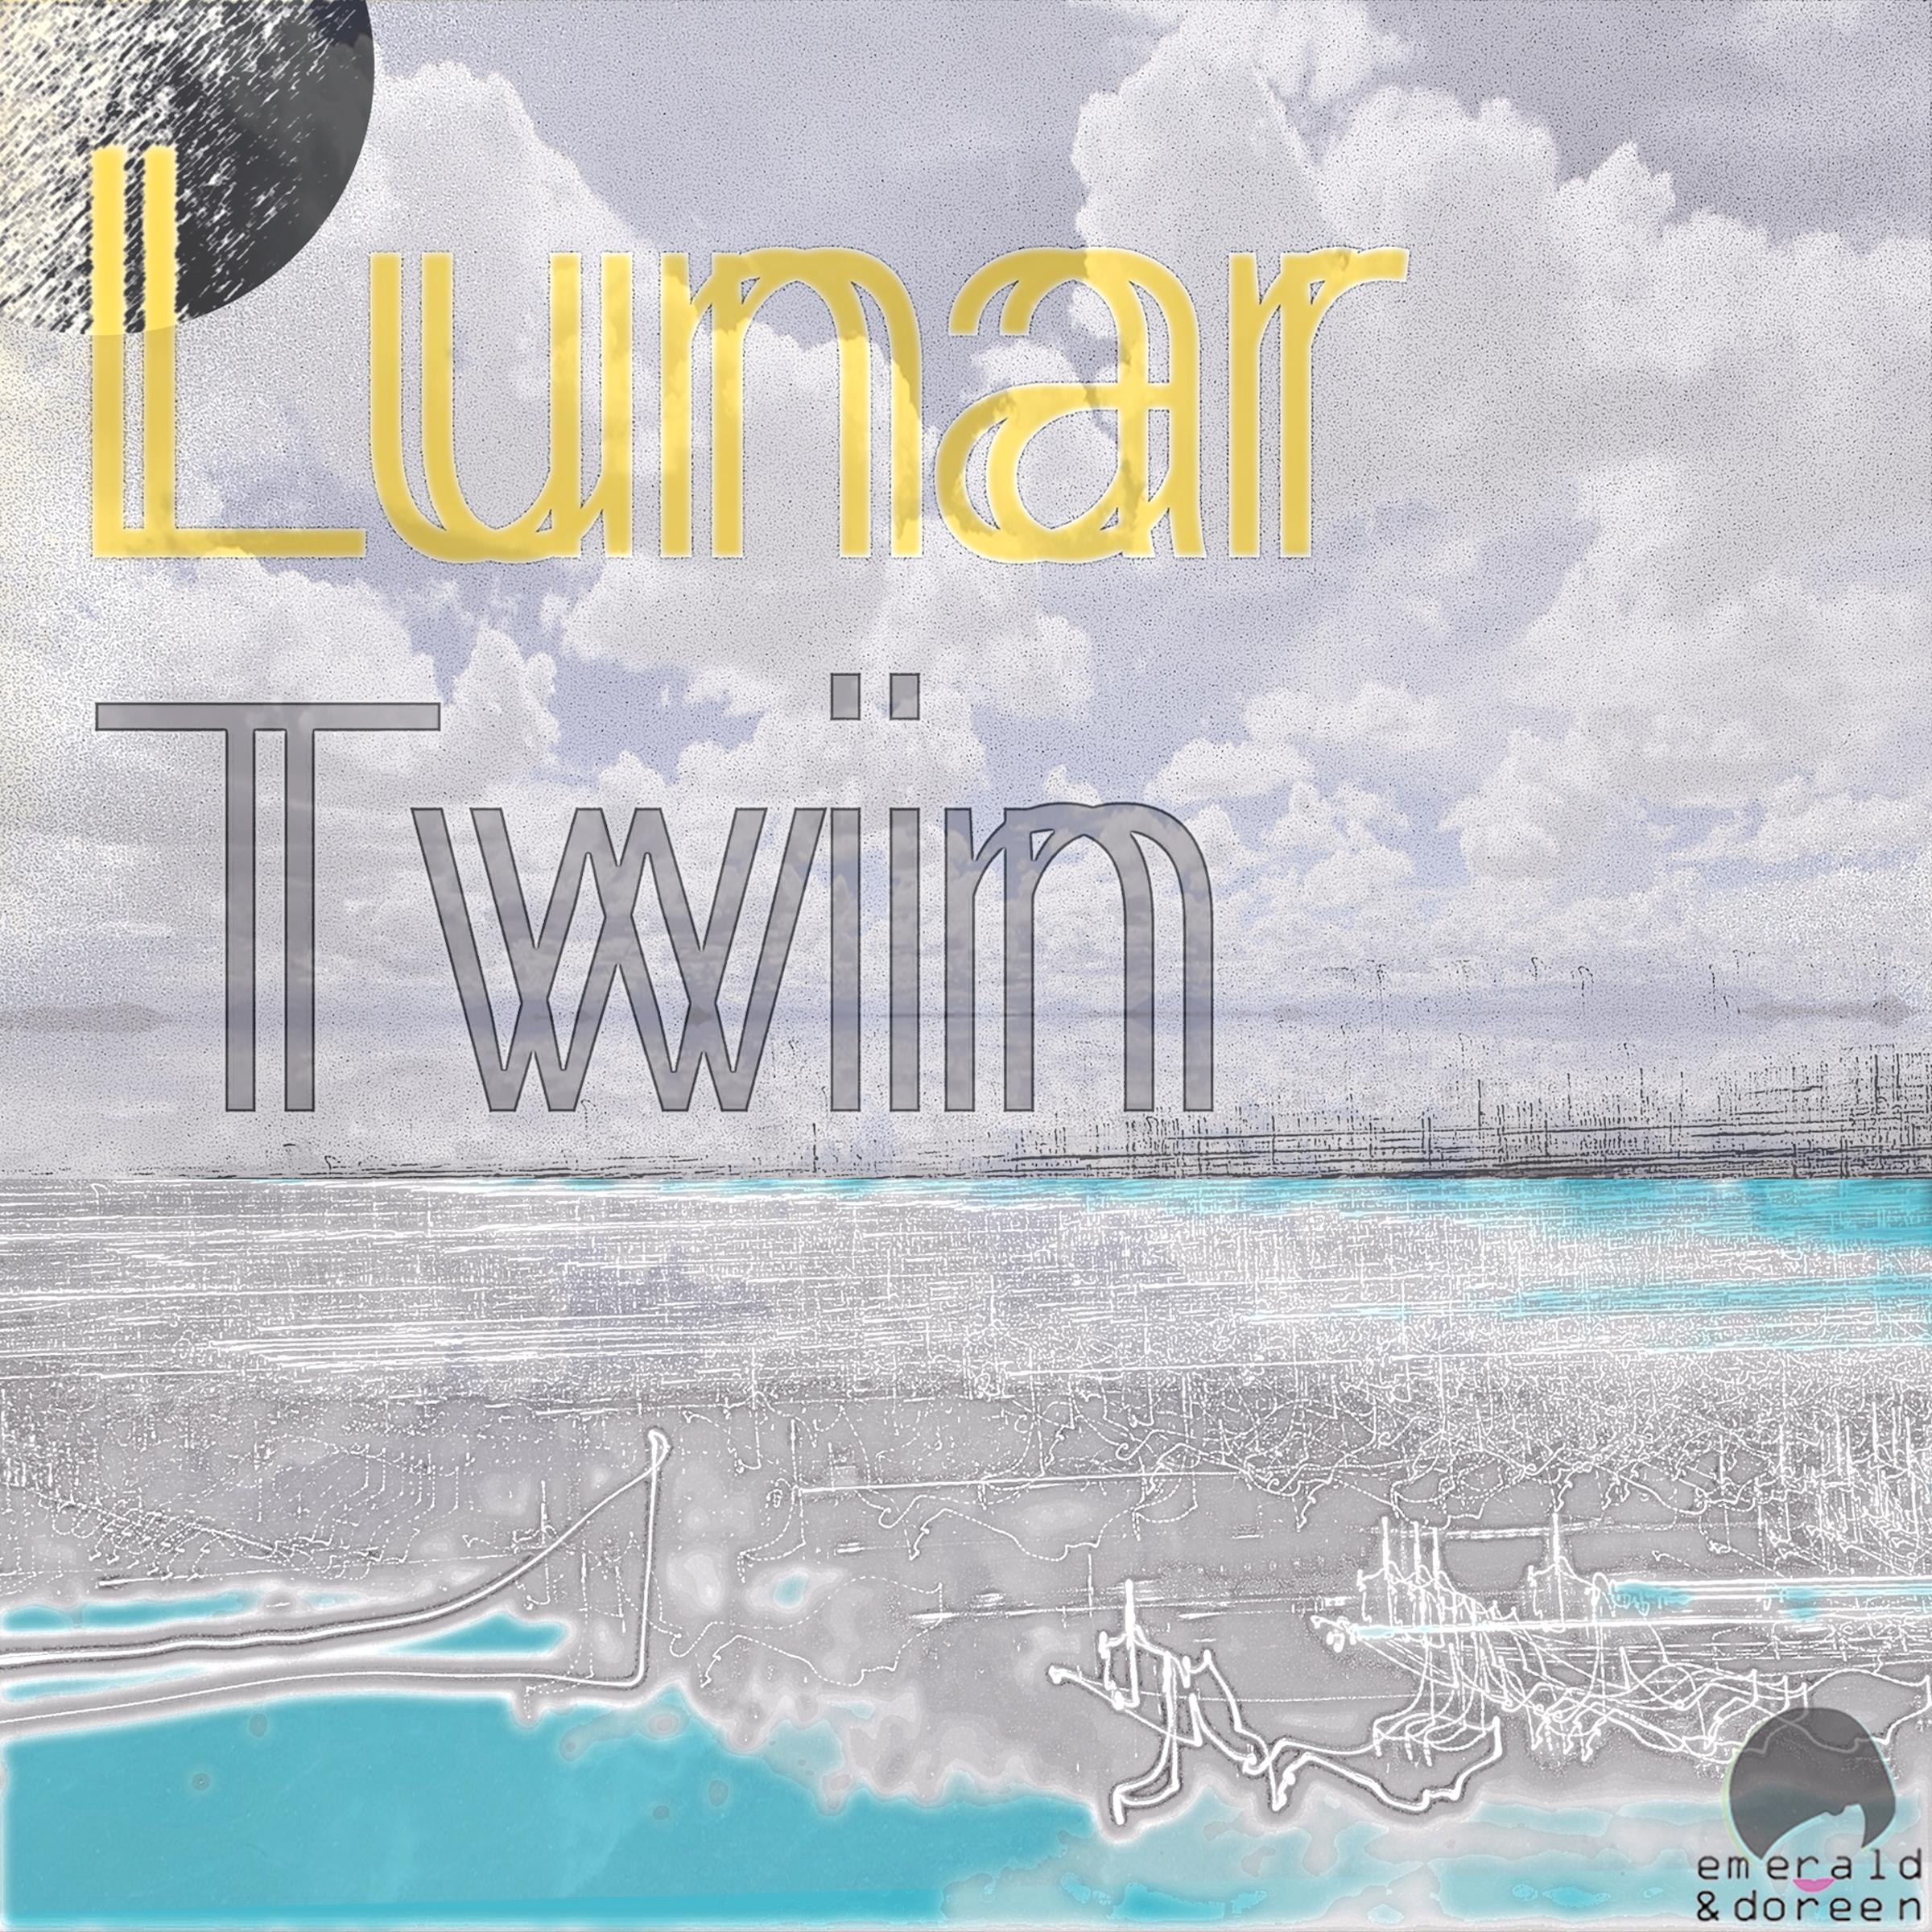 Lunar Twin  - Champagne (Statickman Remix)